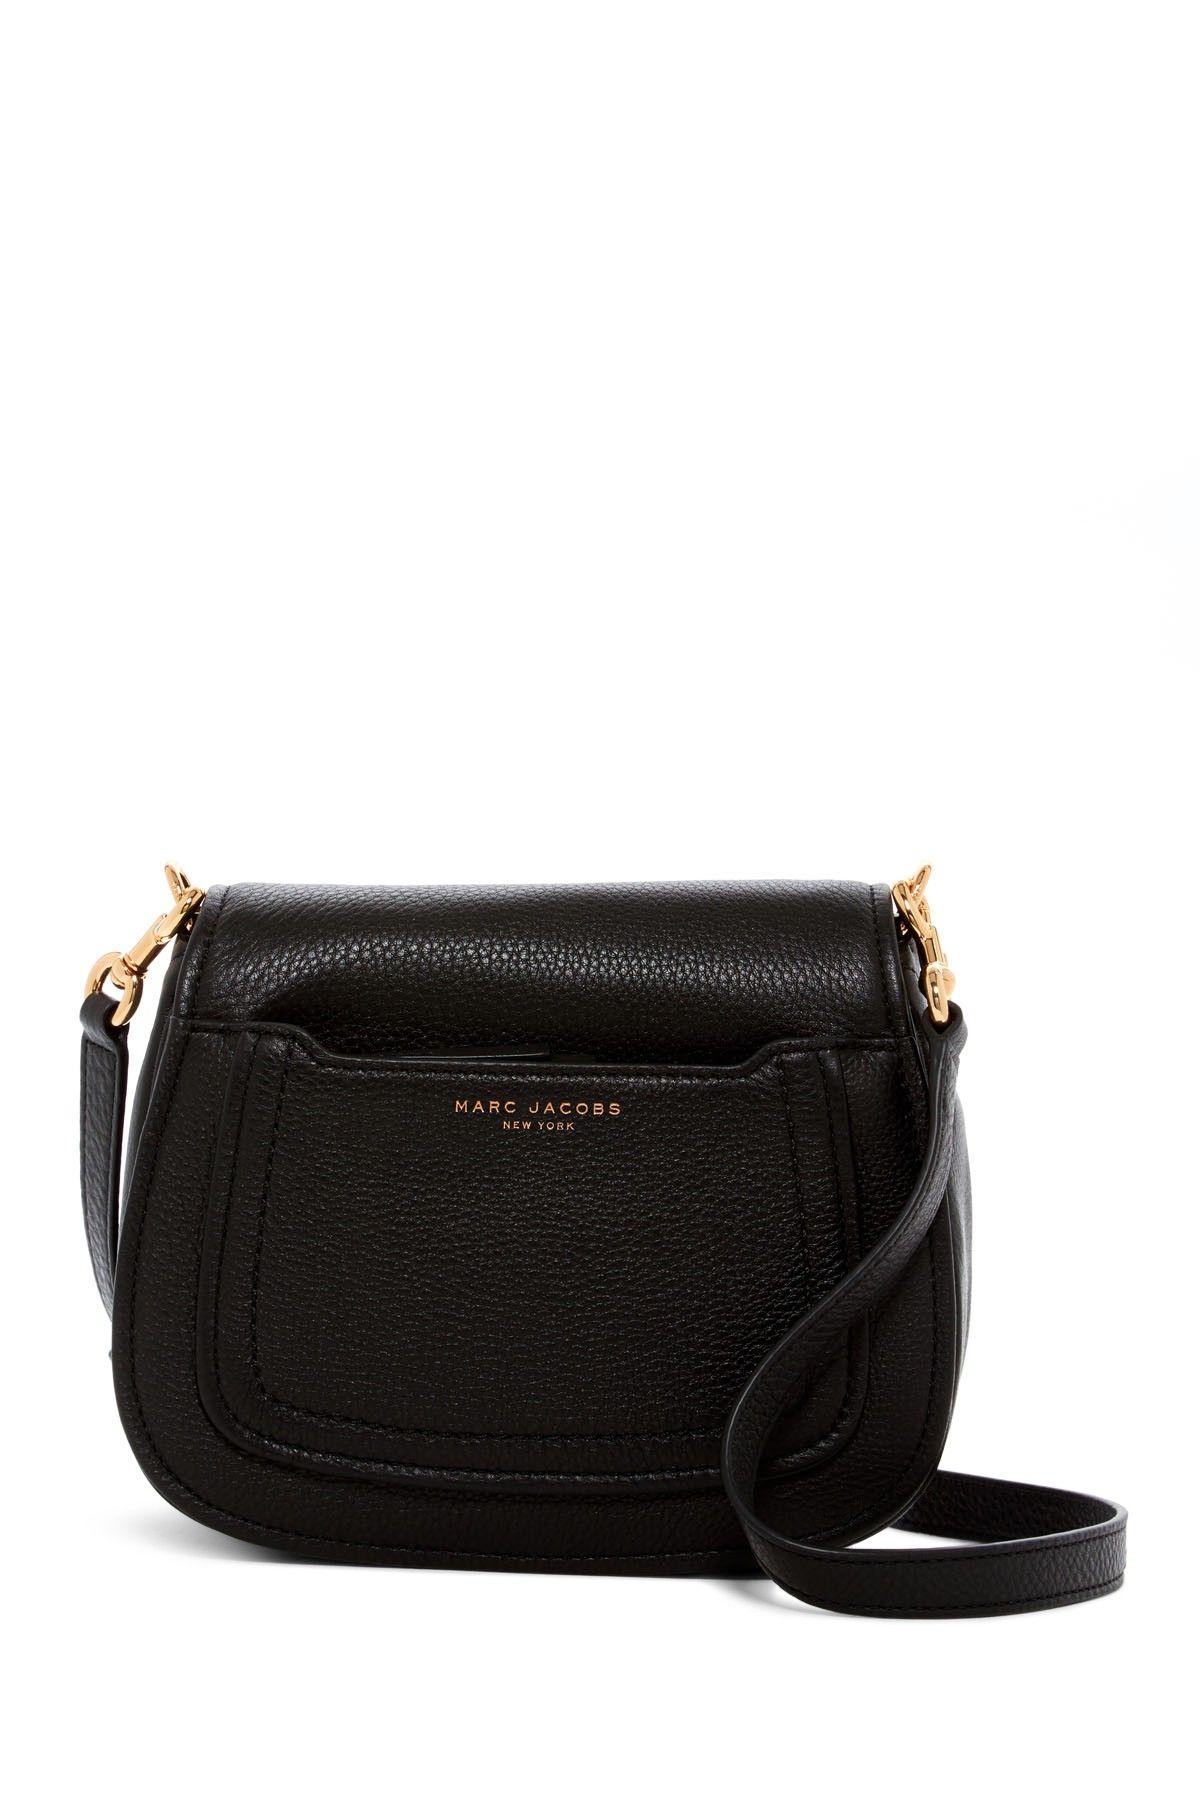 f3e23d1e59cd Empire City Mini Messenger Leather Crossbody Bag by Marc Jacobs on   nordstrom rack